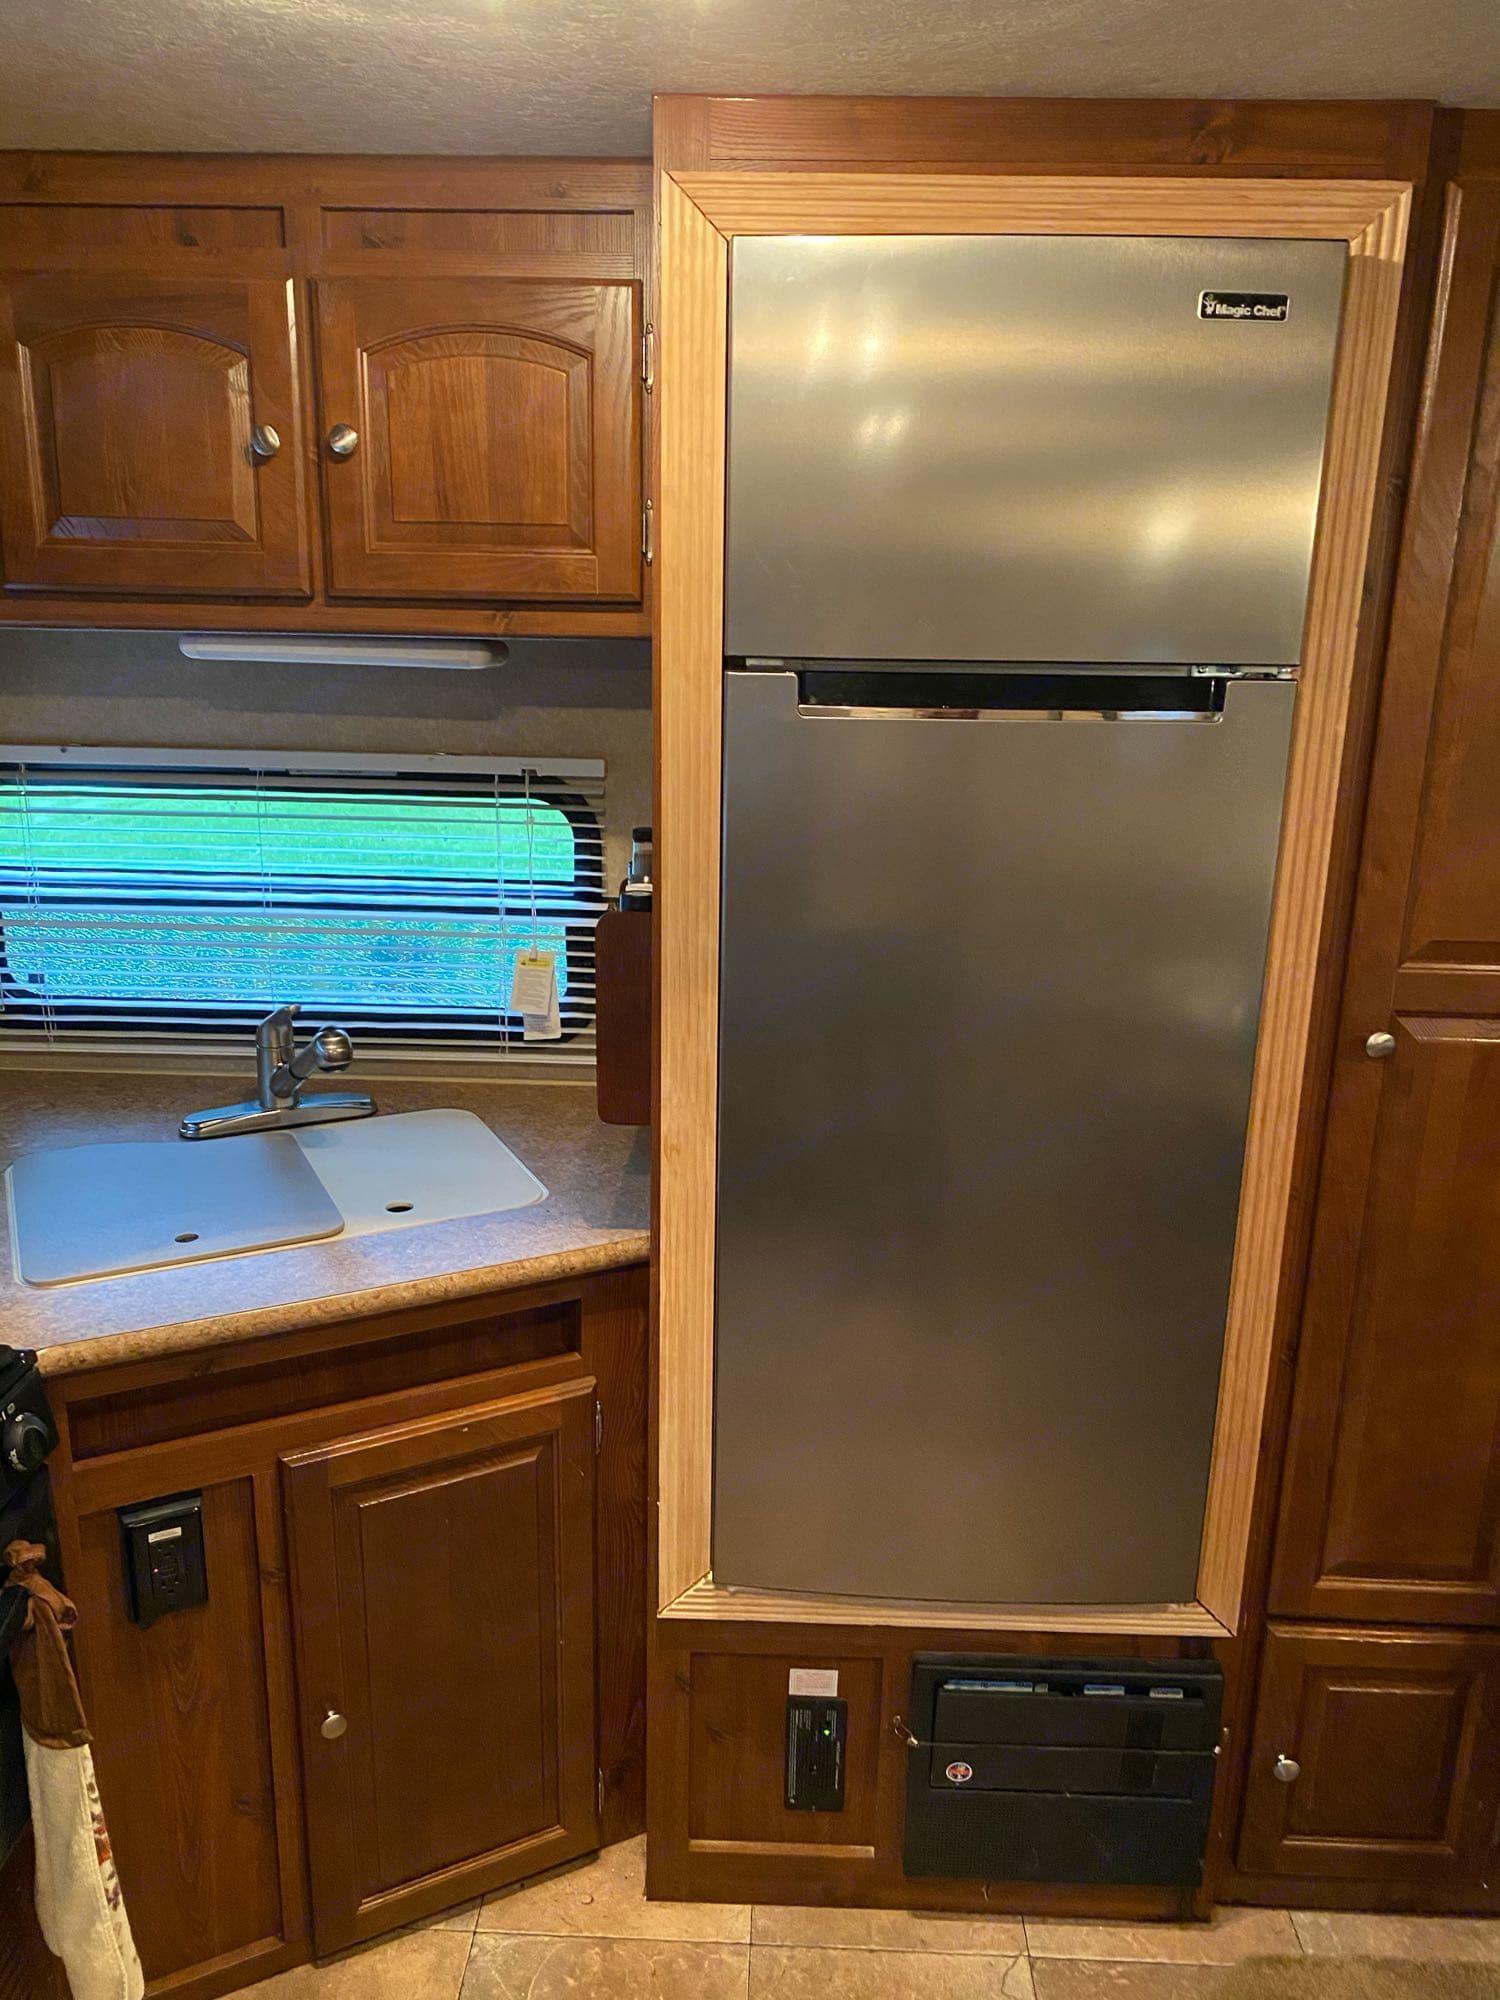 New residential refrigerator. Forest River Rockwood Windjammer 2012